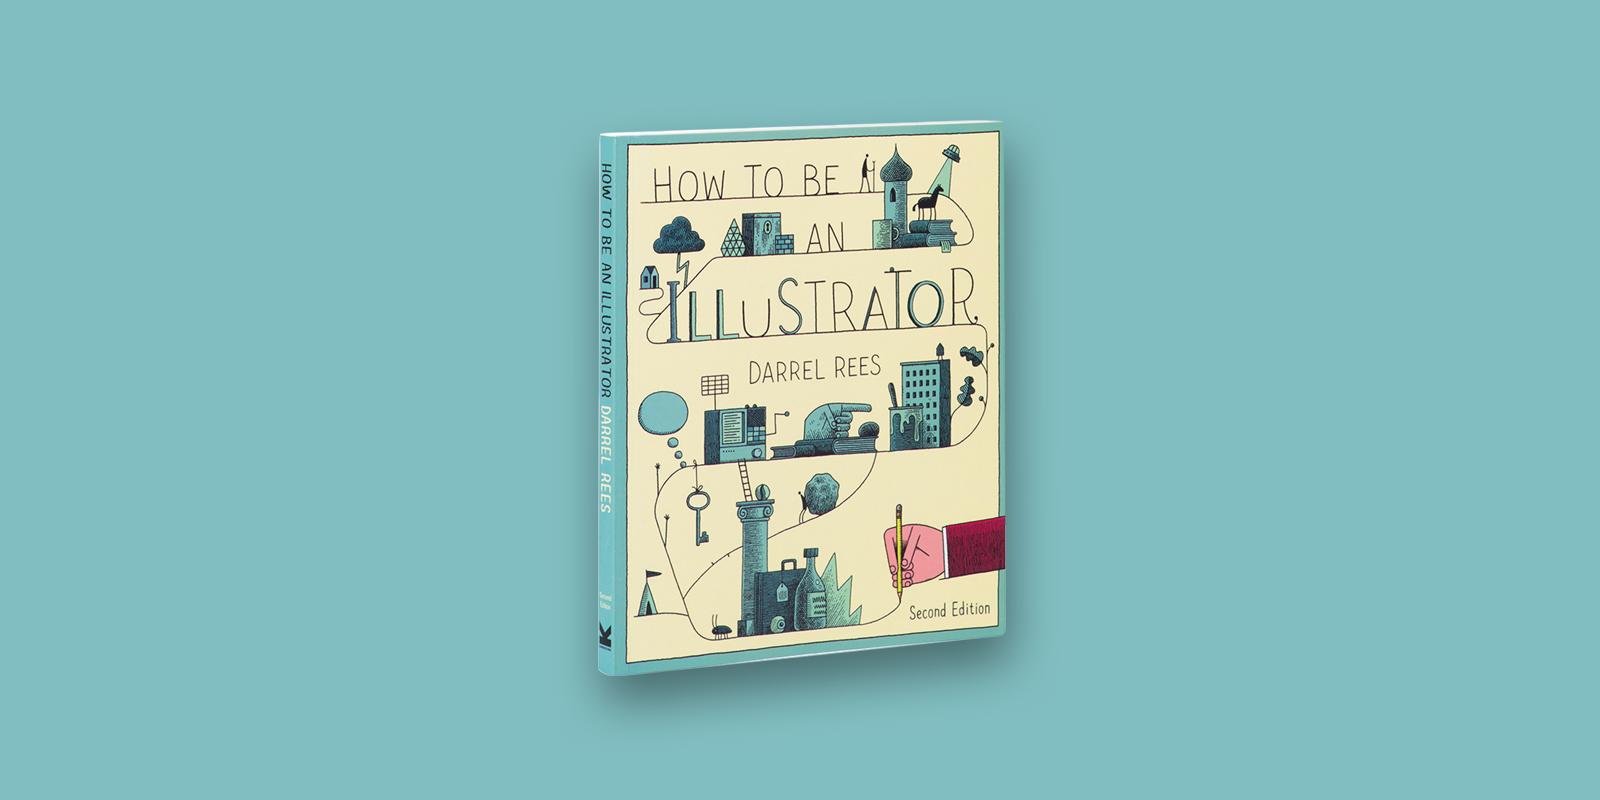 How To Be An Illustrator Best Digital Art Books